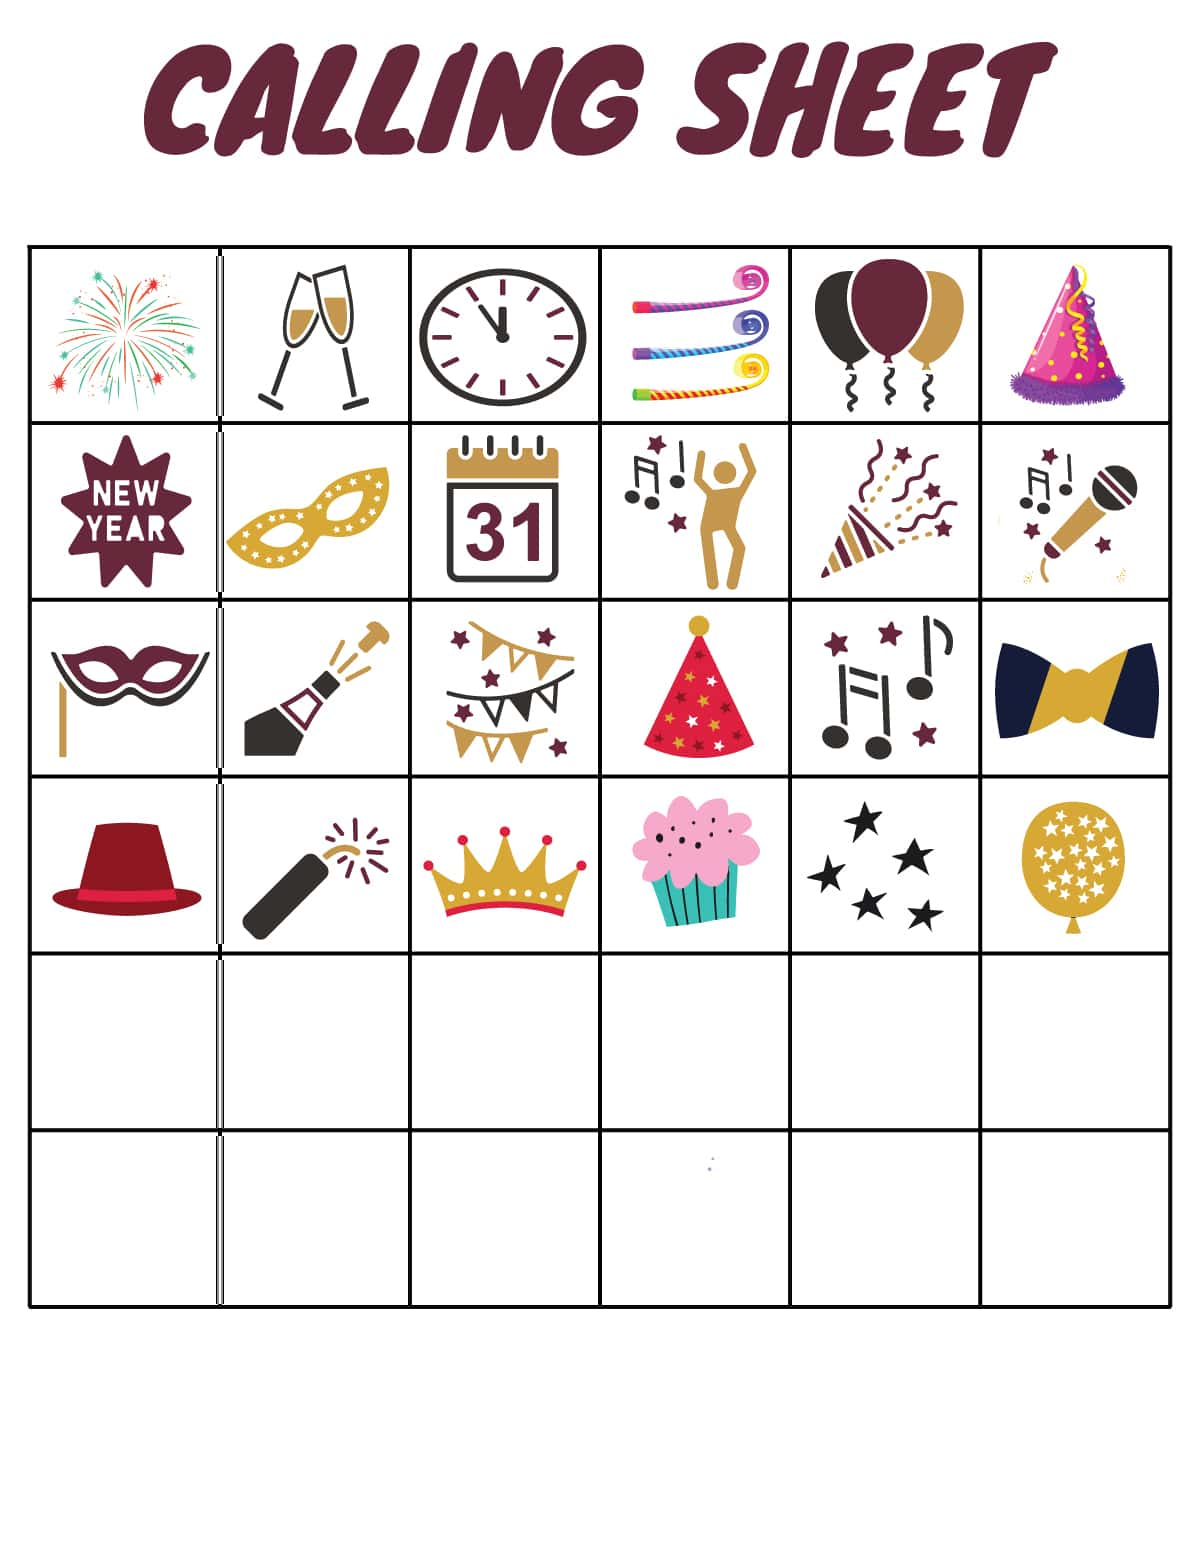 New Year's Eve bingo calling sheet